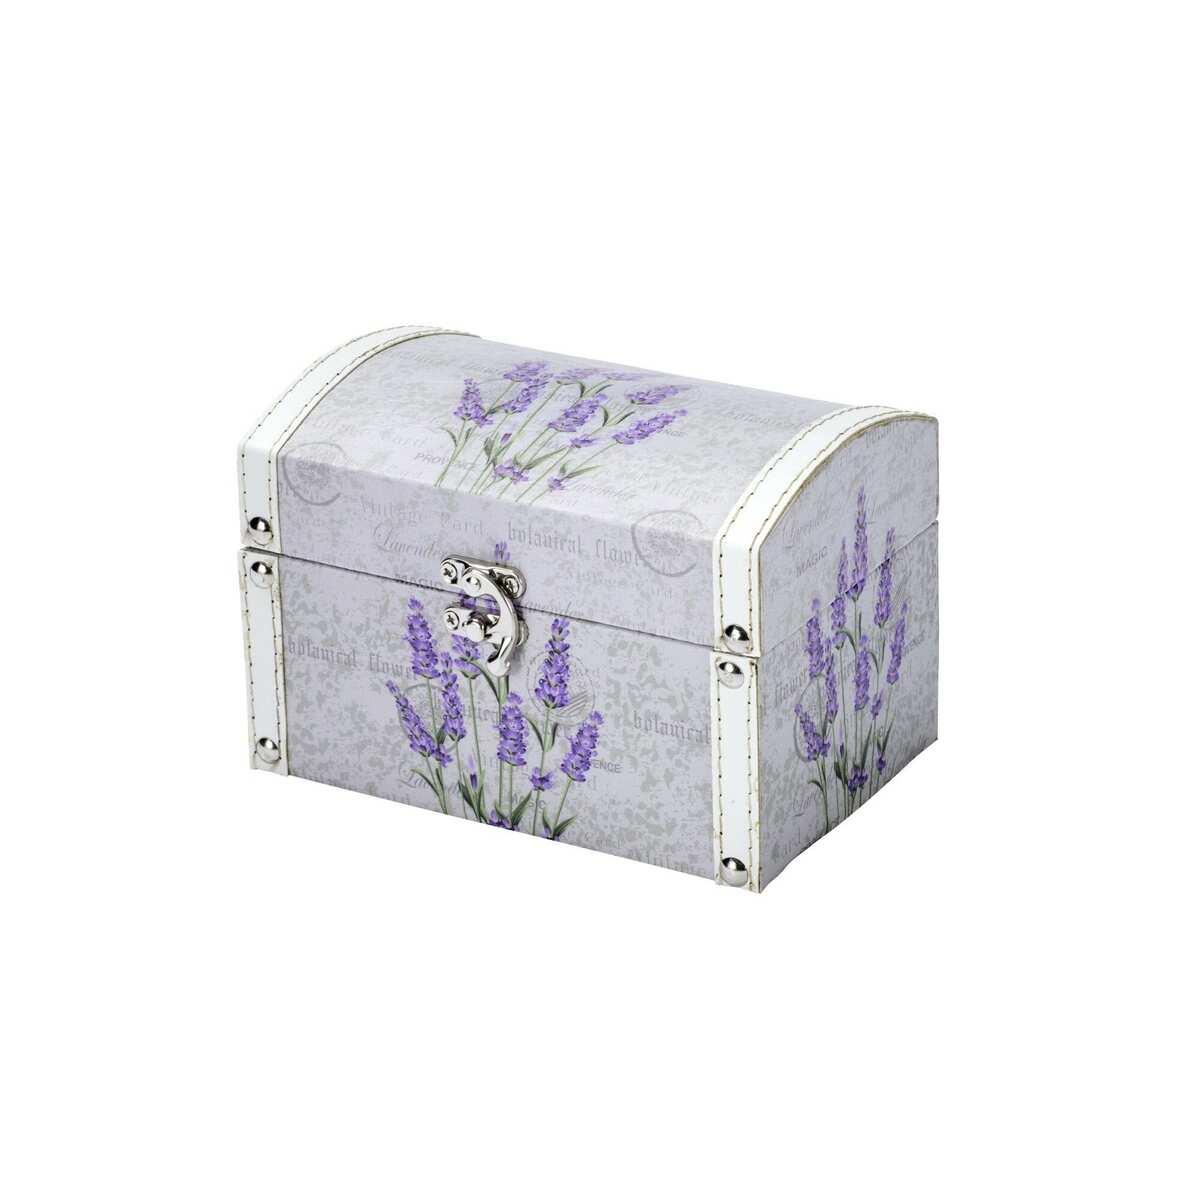 Bild 1 von Deko-Box in tollem Lavendel-Design